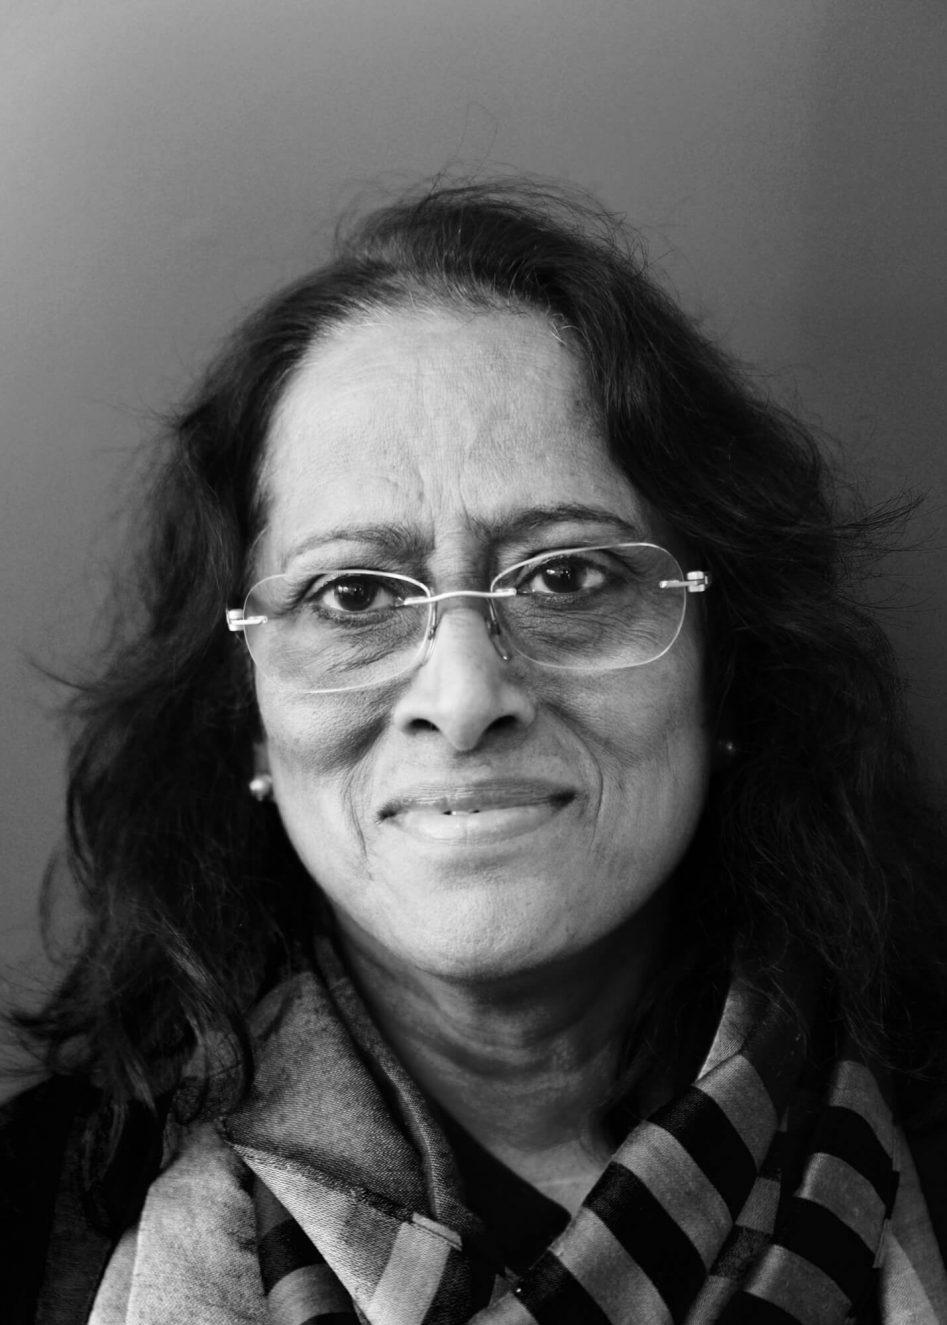 Dr. Sumathy Krishnaswamy